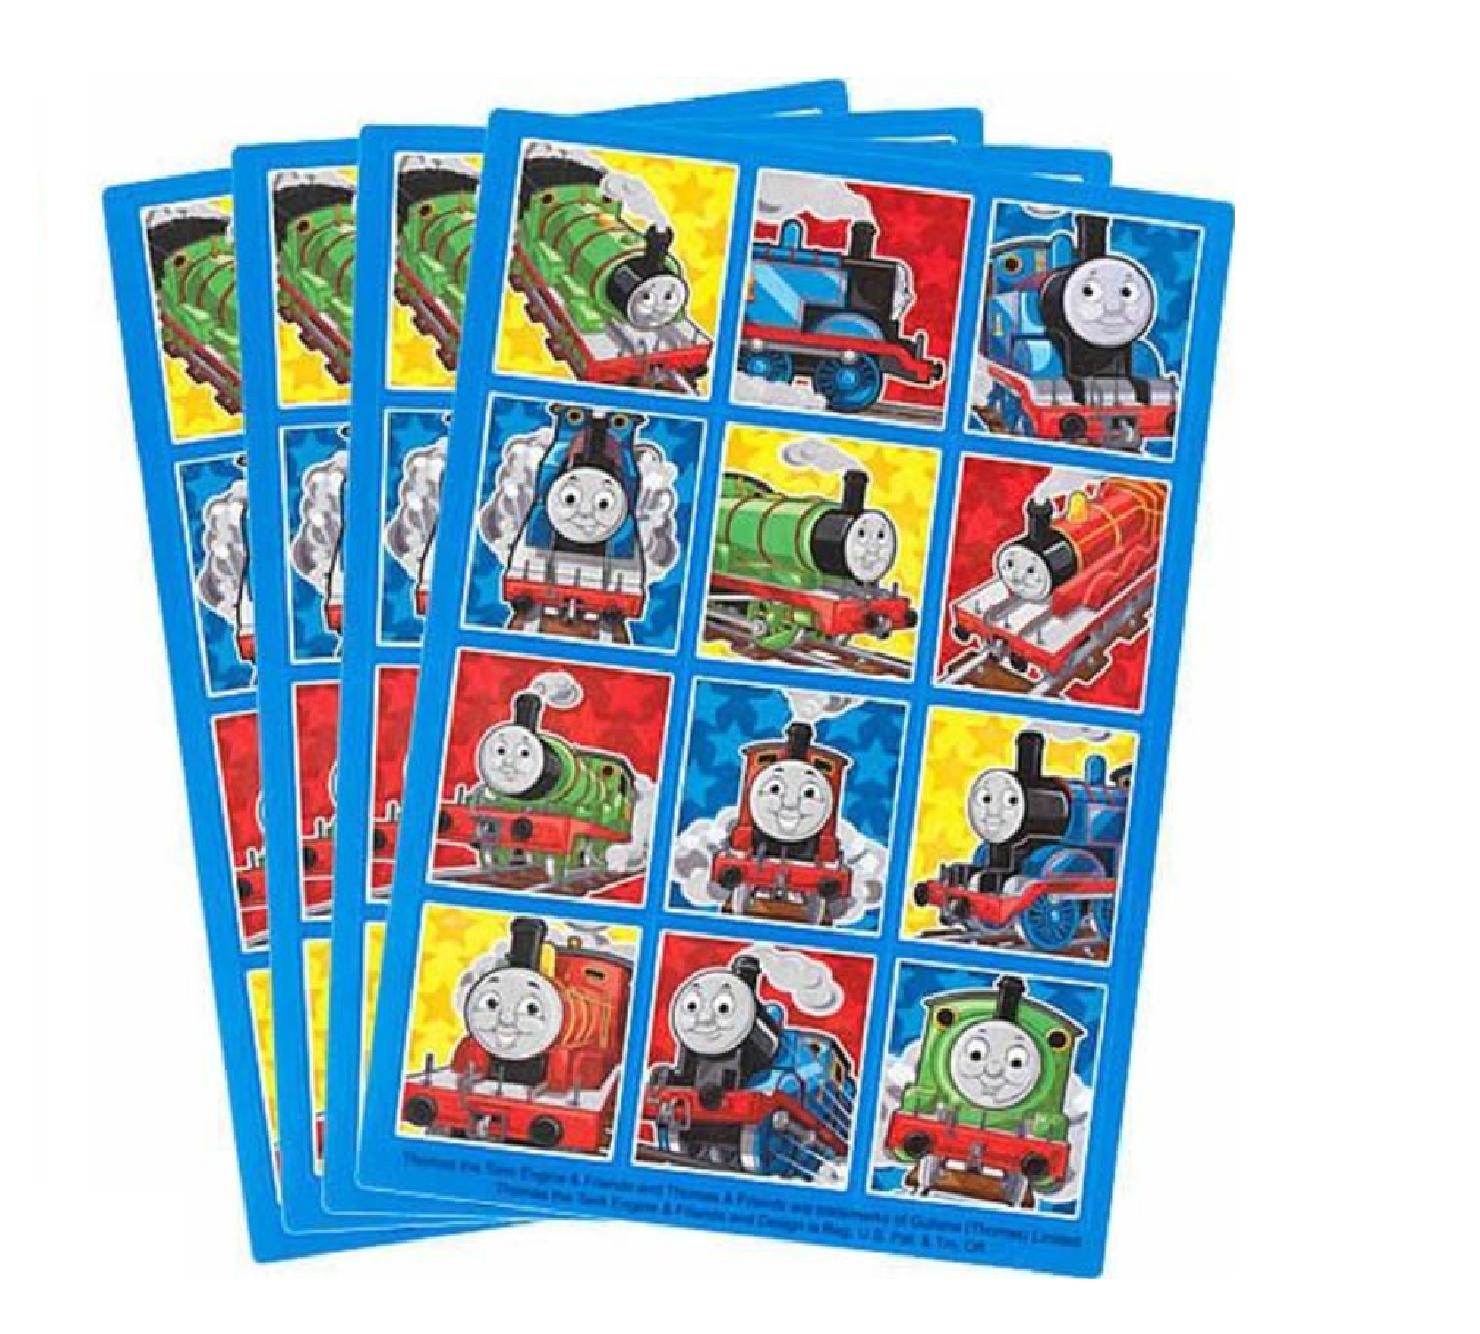 Thomas the Train - Trains, Tracks, Accessories, & More